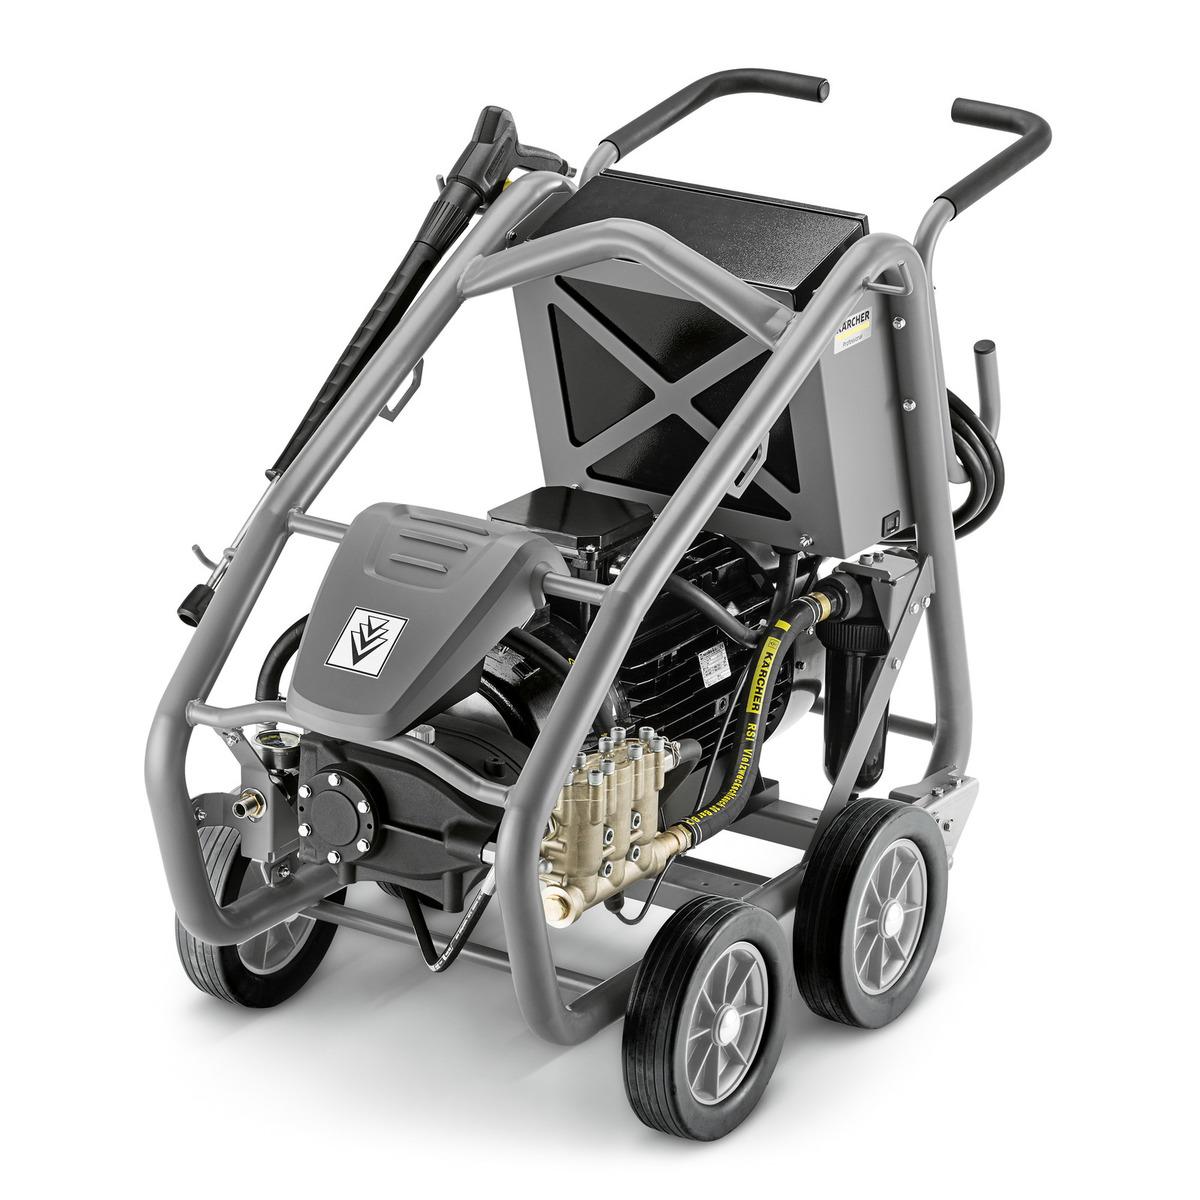 HD 18/50-4 Cage Classic超高压清洗机